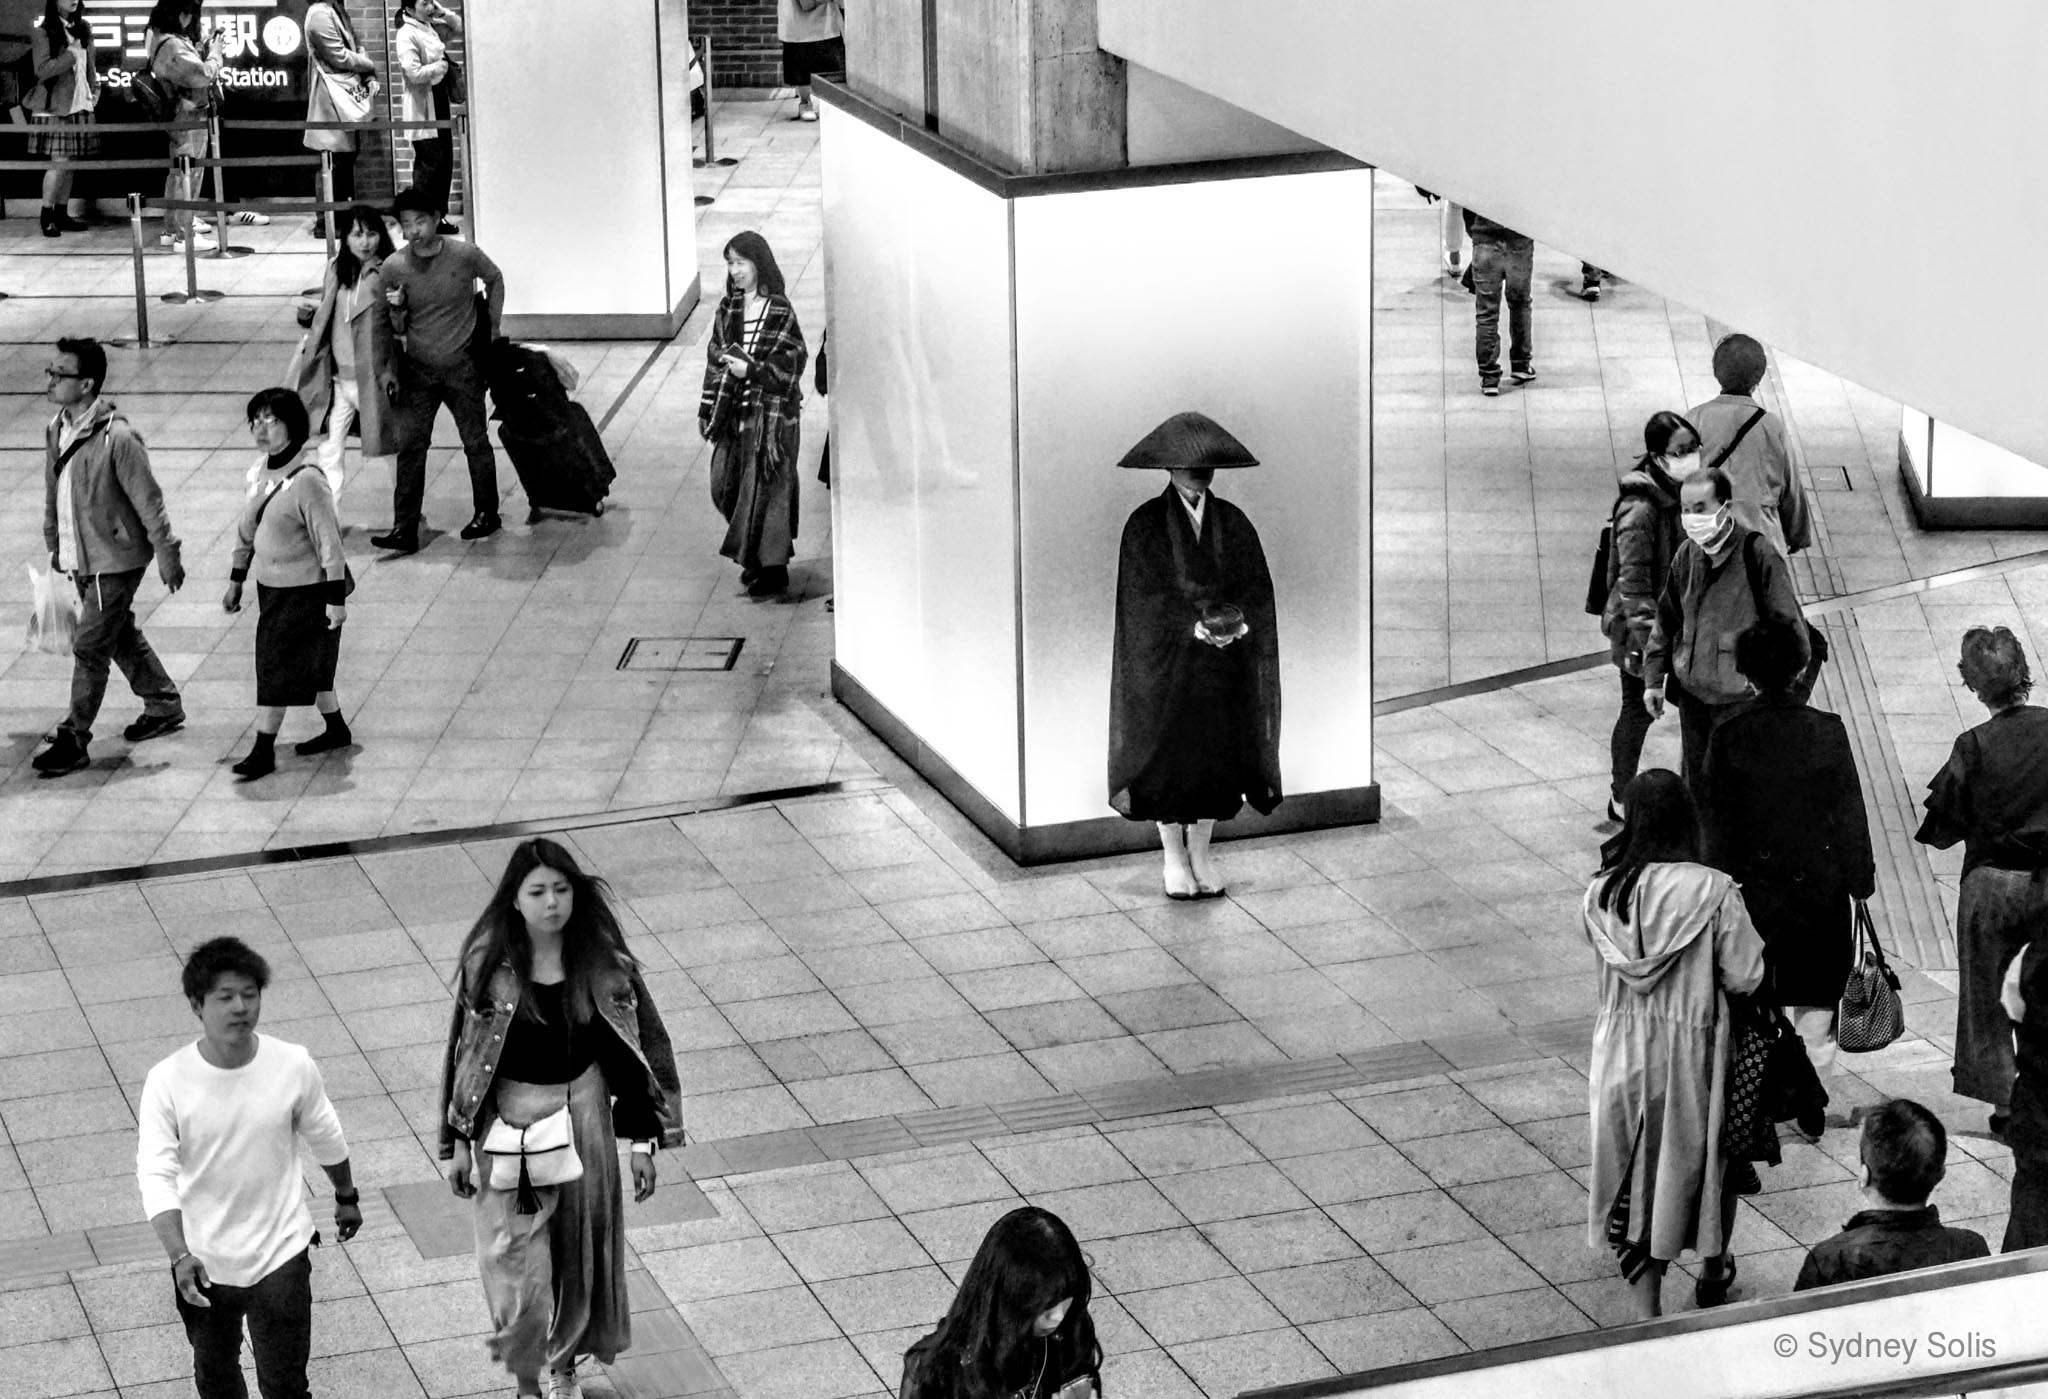 Zen monk in Umeda Station, Osaka, Japan photo by Sydney Solis.